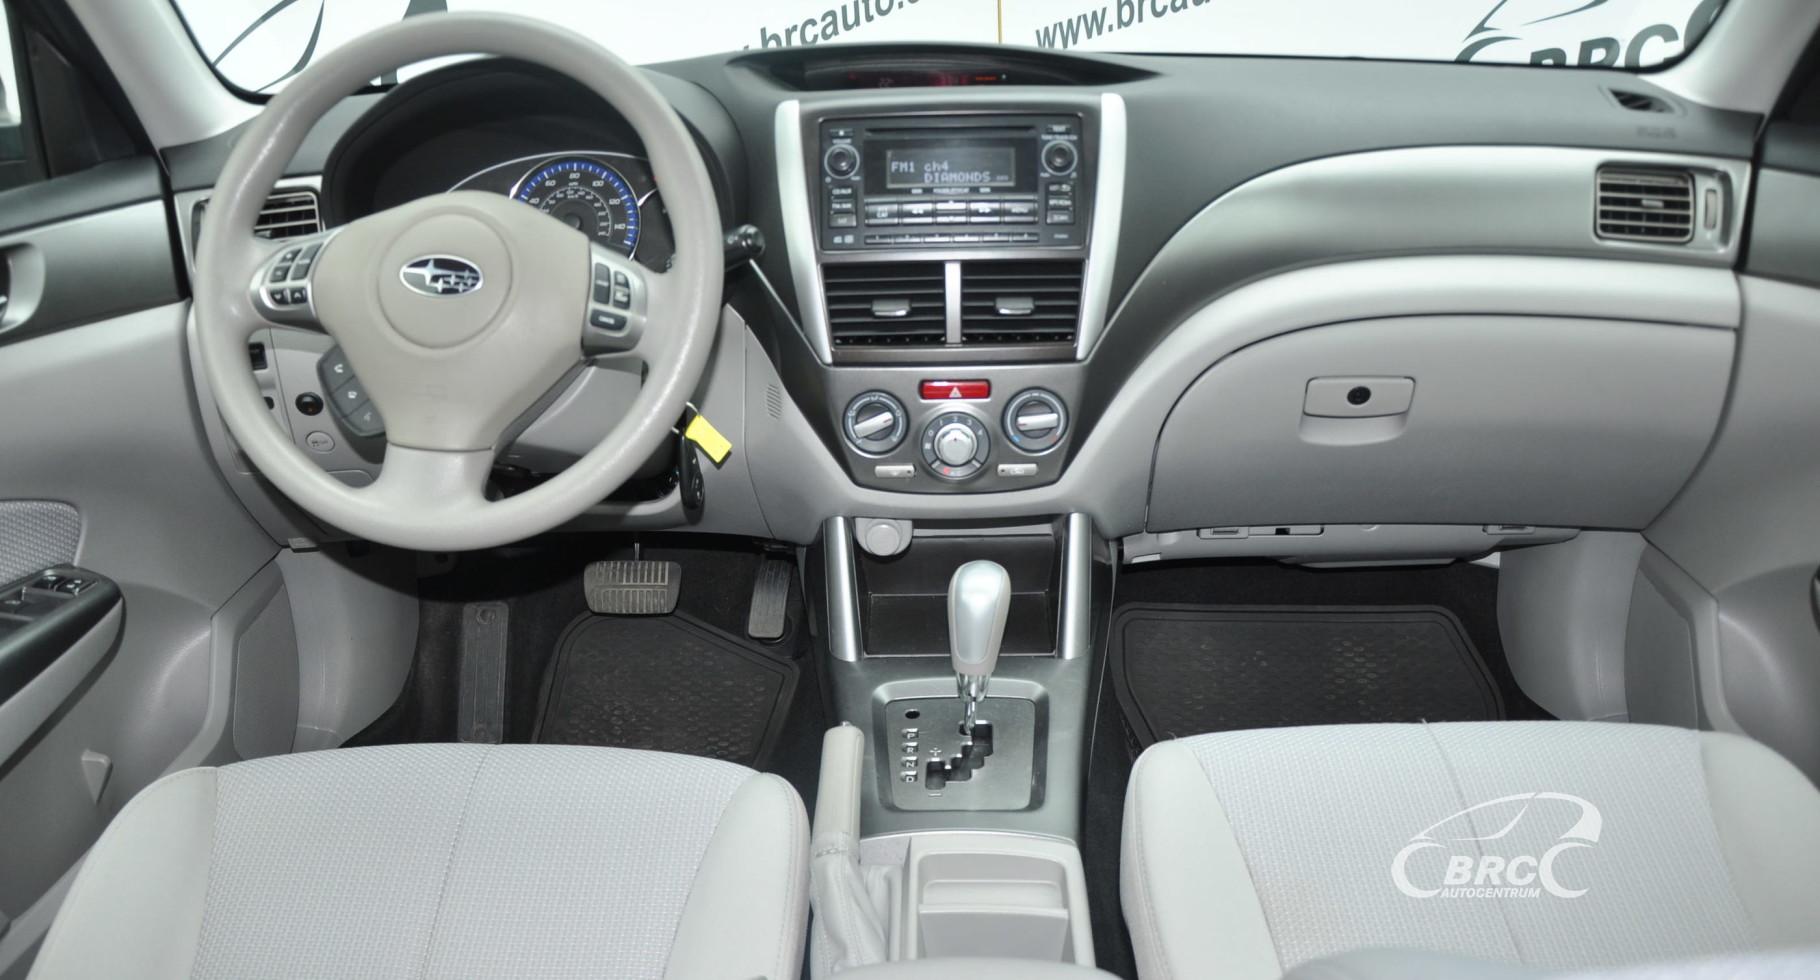 Subaru Forester 2.5i AWD Automatas